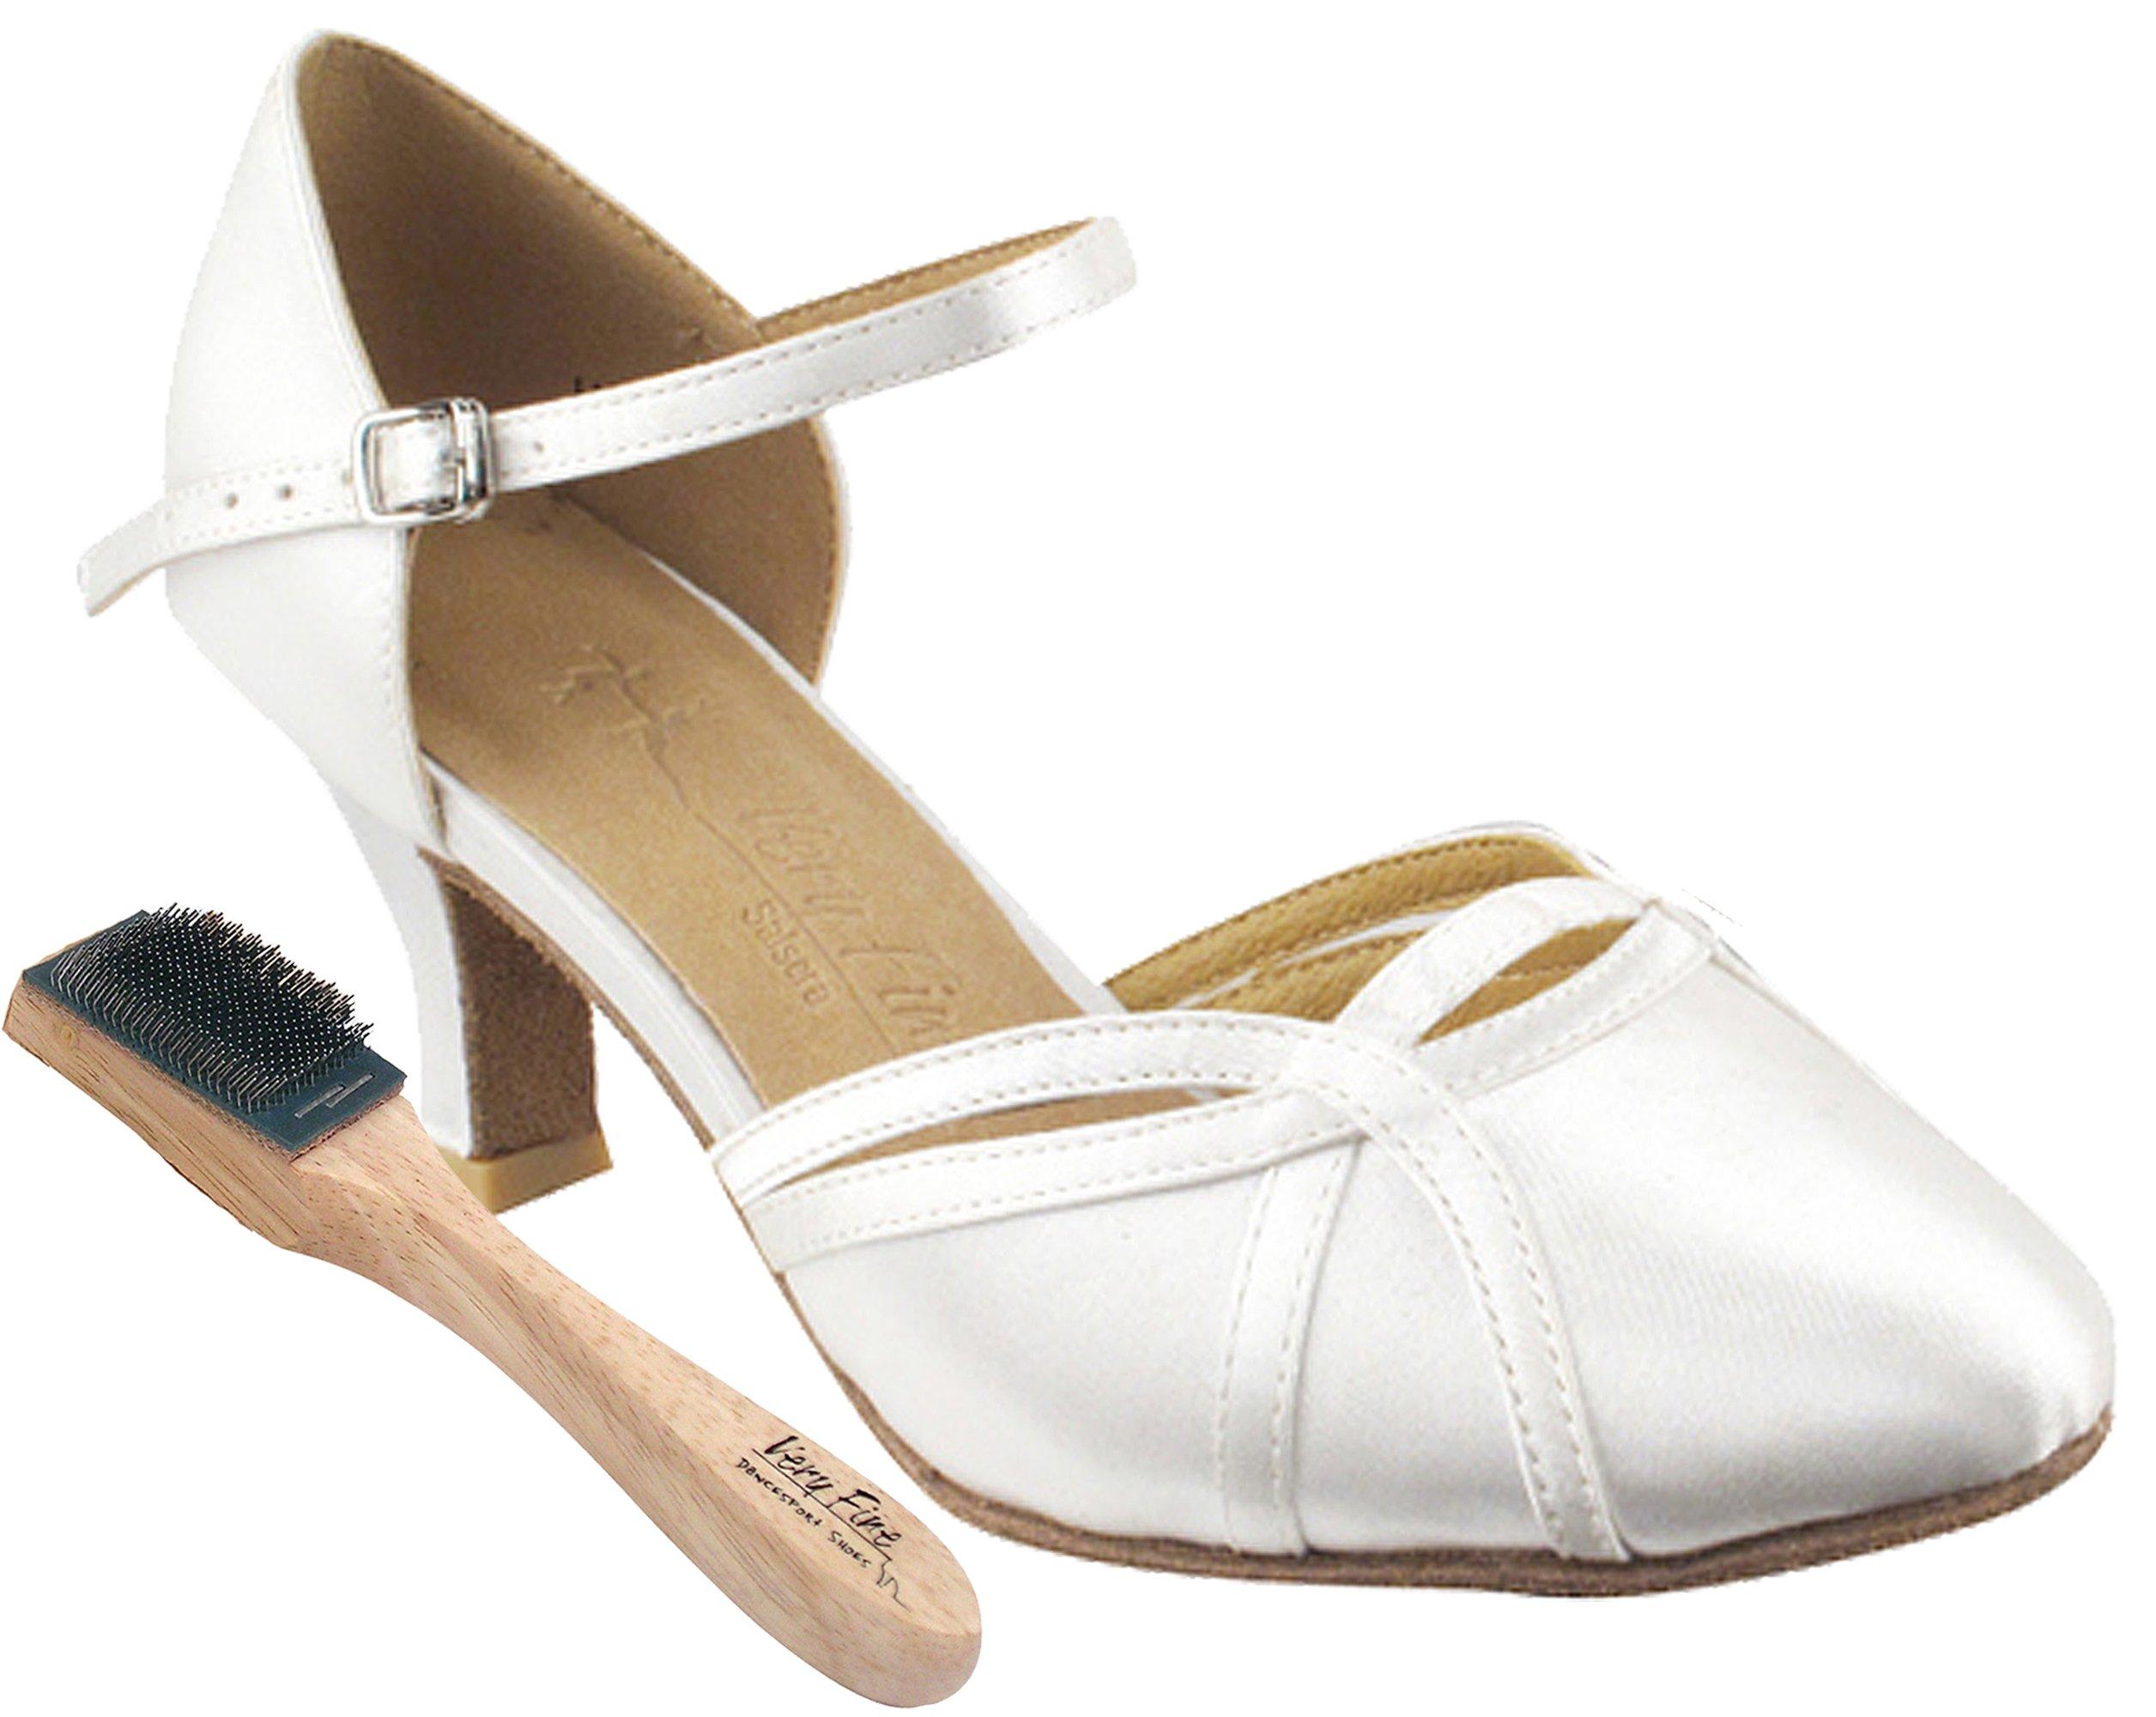 Very Fine Women's Salsa Ballroom Tango Dance Shoes Style Sera 3540 Bundle with Dance Shoe Wire brush, White Satin 9 M US Heel 2.5 Inch